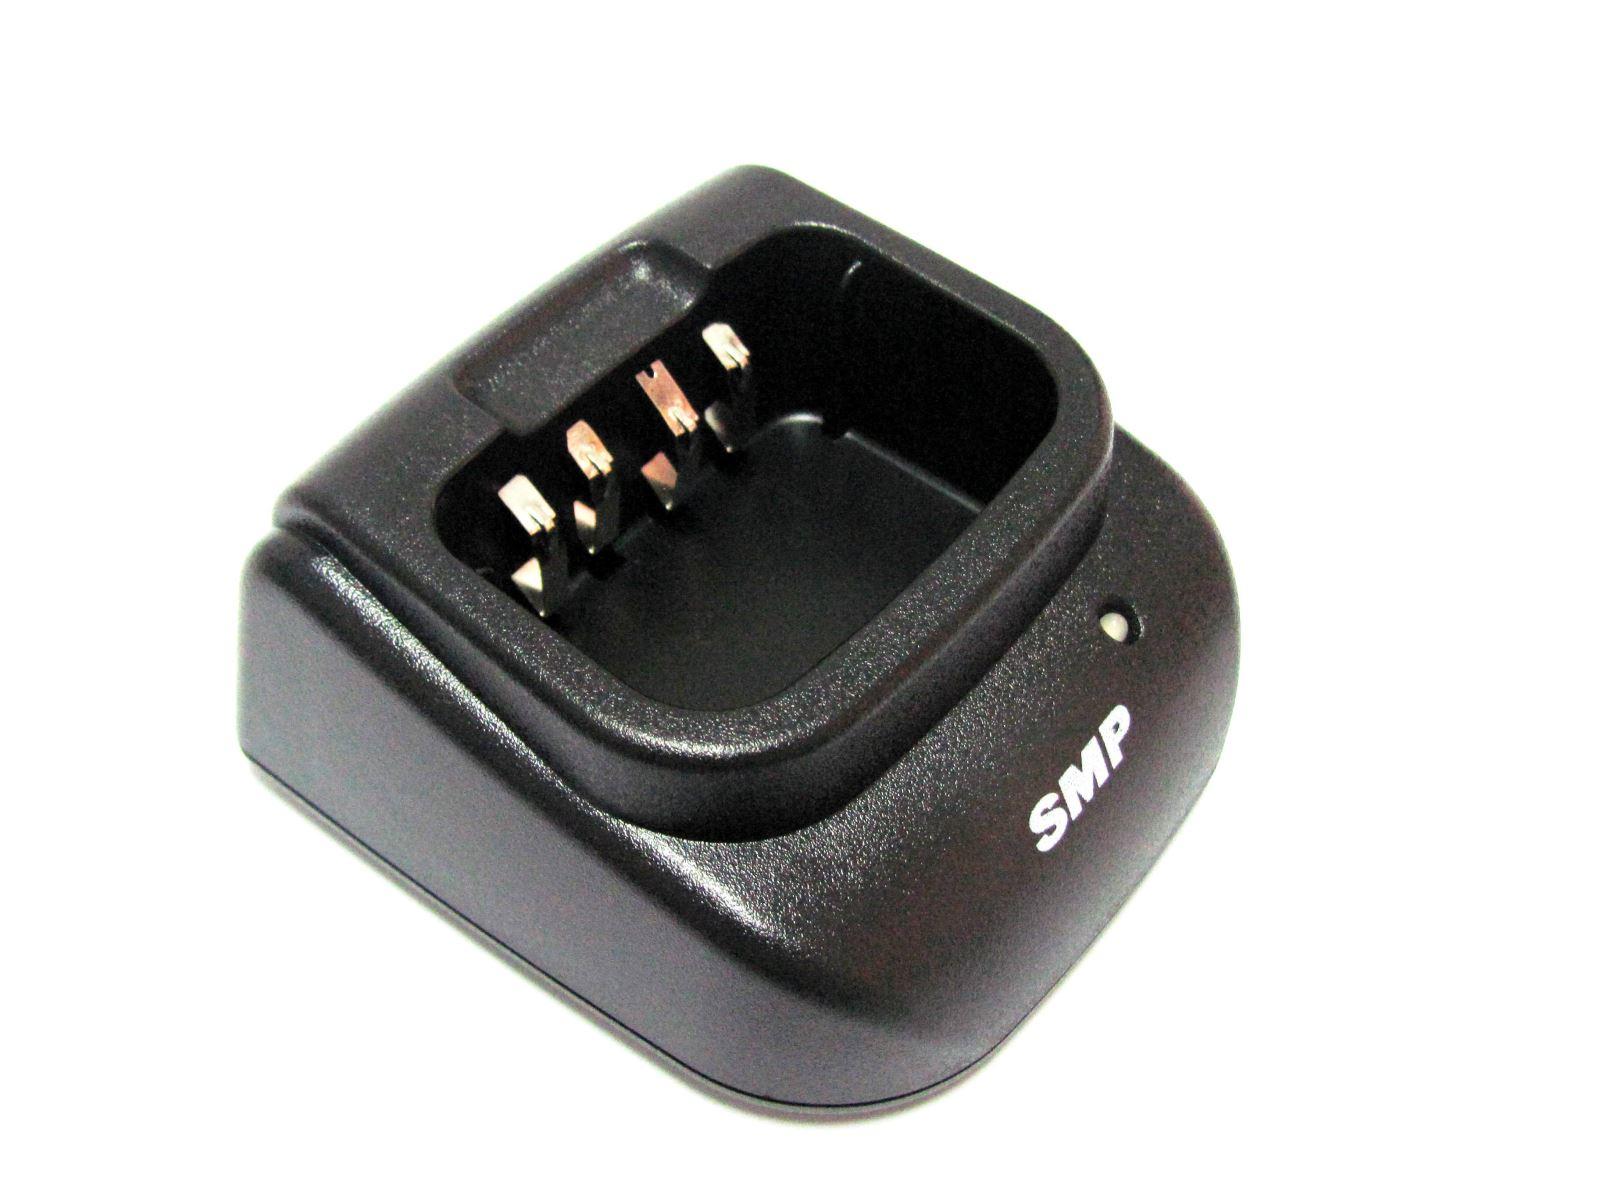 sạc Máy bộ đàm cầm tay Motorola SMP 418